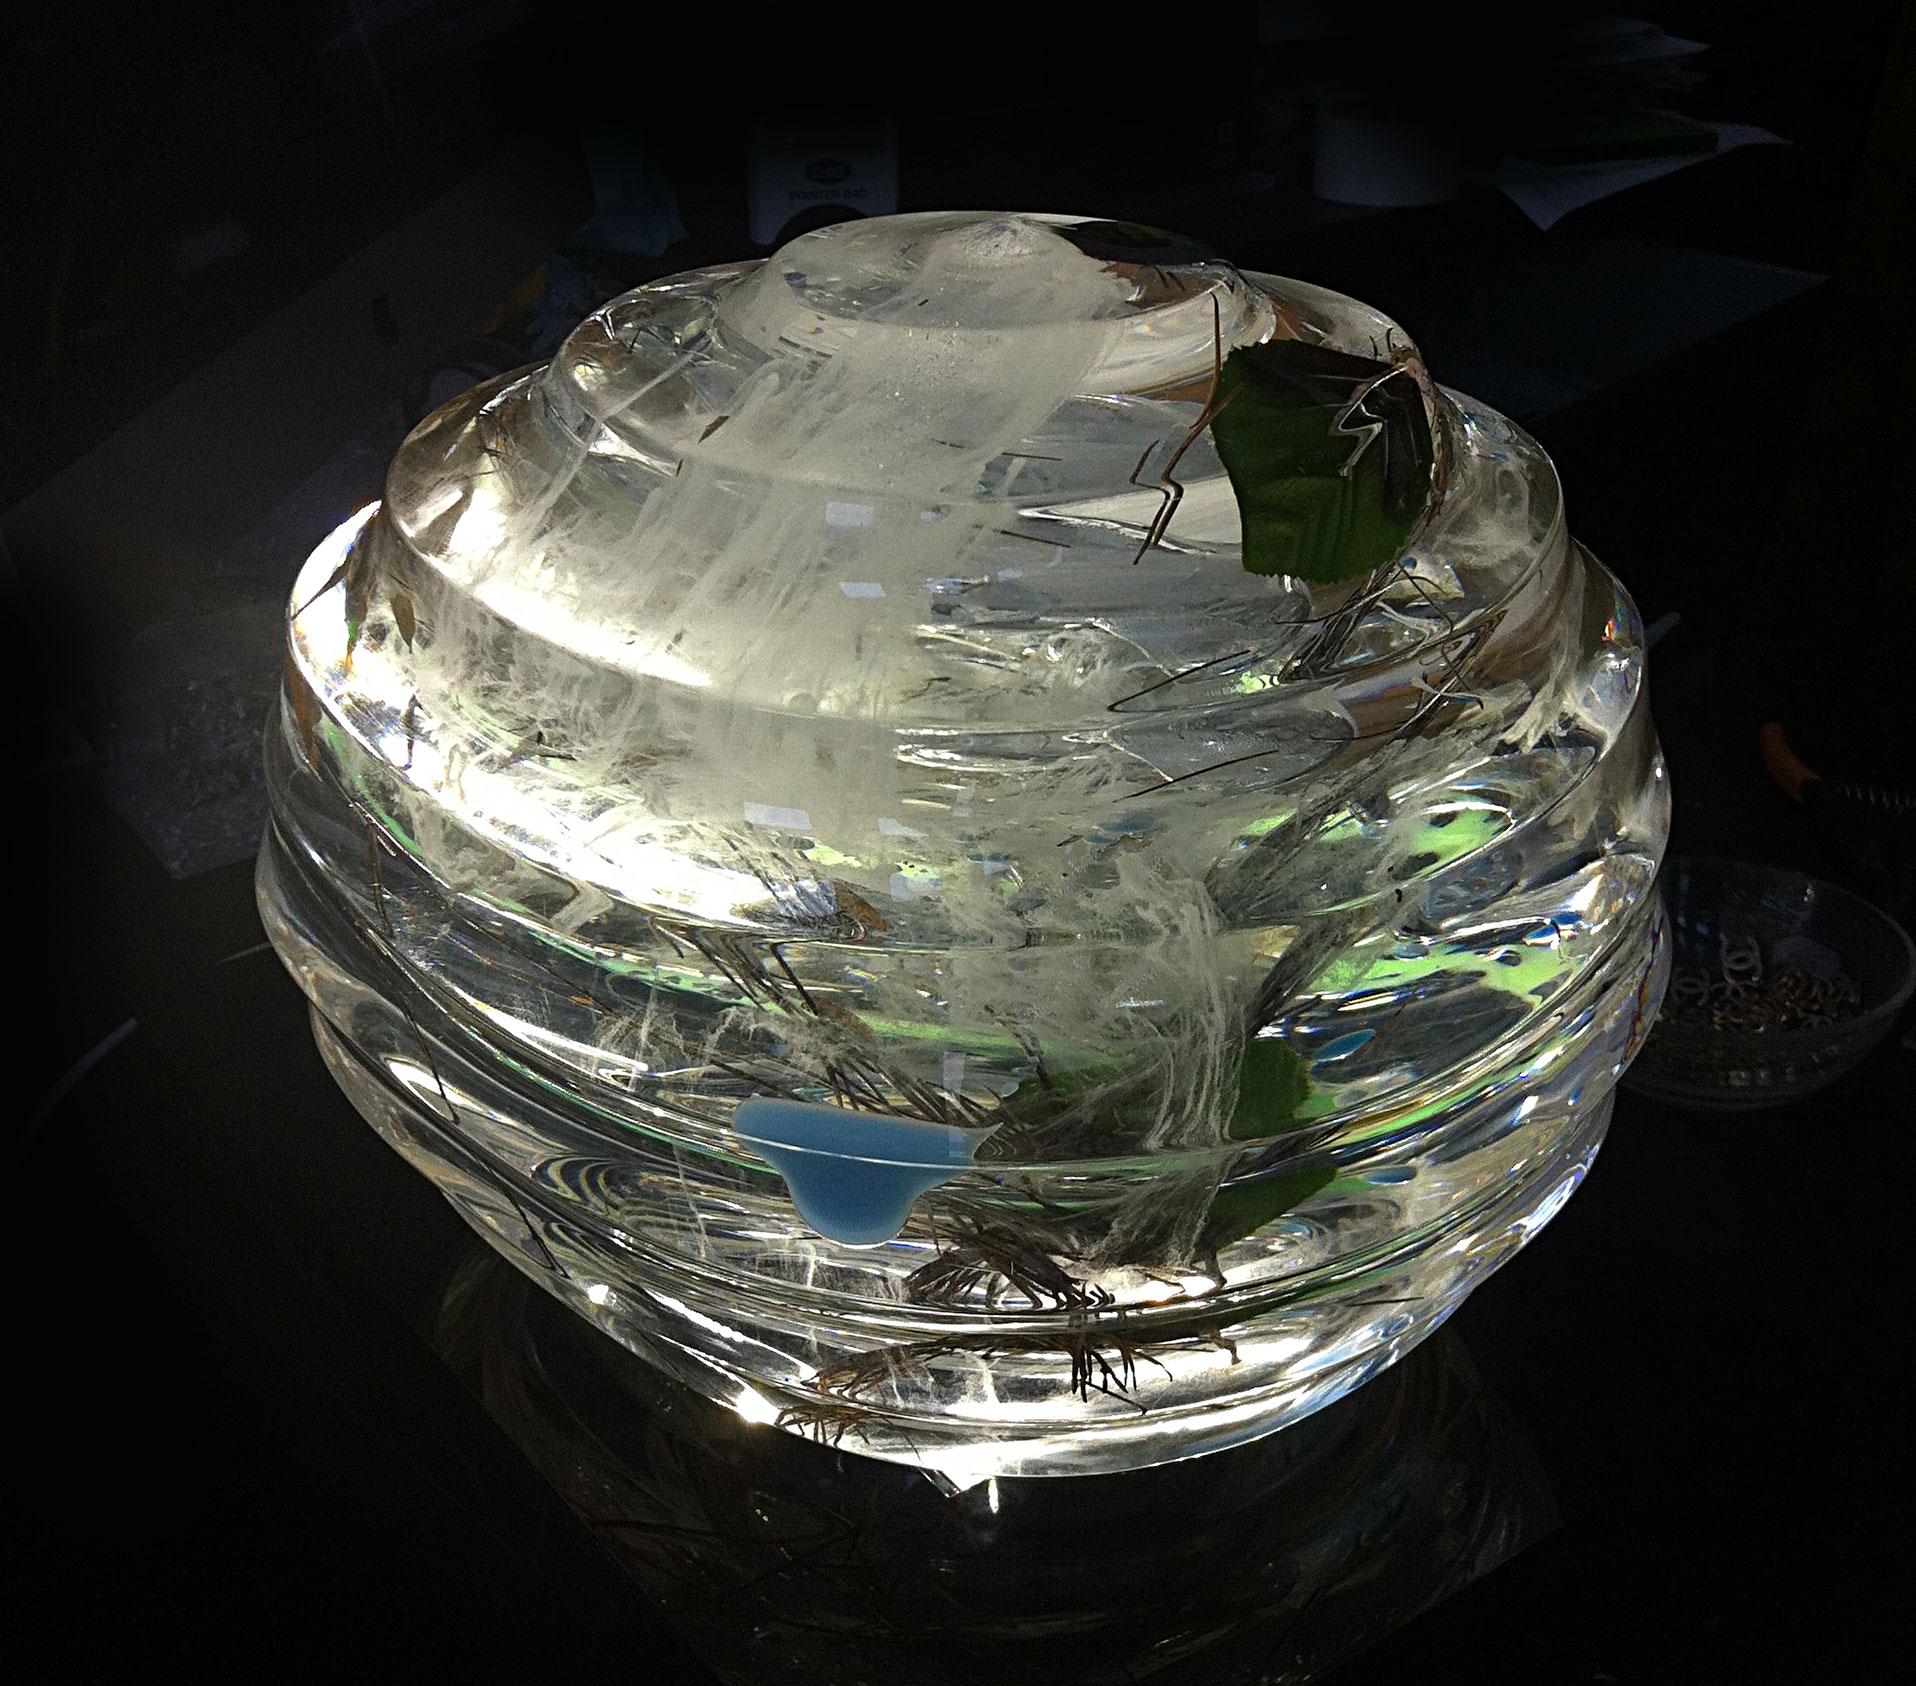 Tsunami - Materiali inglobati nel plexiglas - L31xH26xP22 cm - 2014